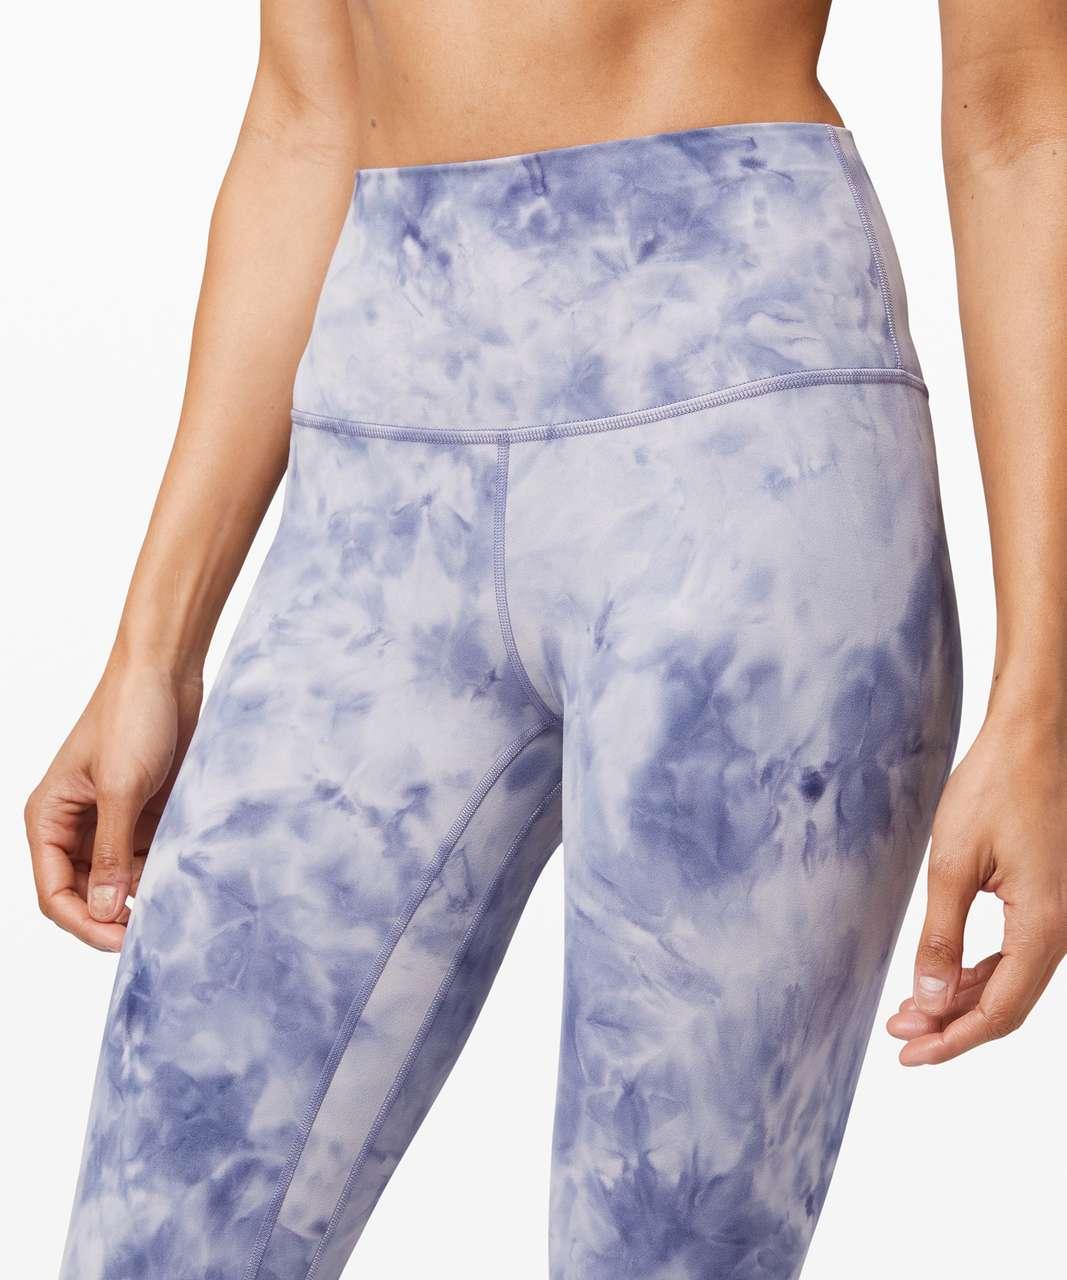 "Lululemon Align Pant 25"" *Diamond Dye - Diamond Dye Iced Iris Peri Purple"